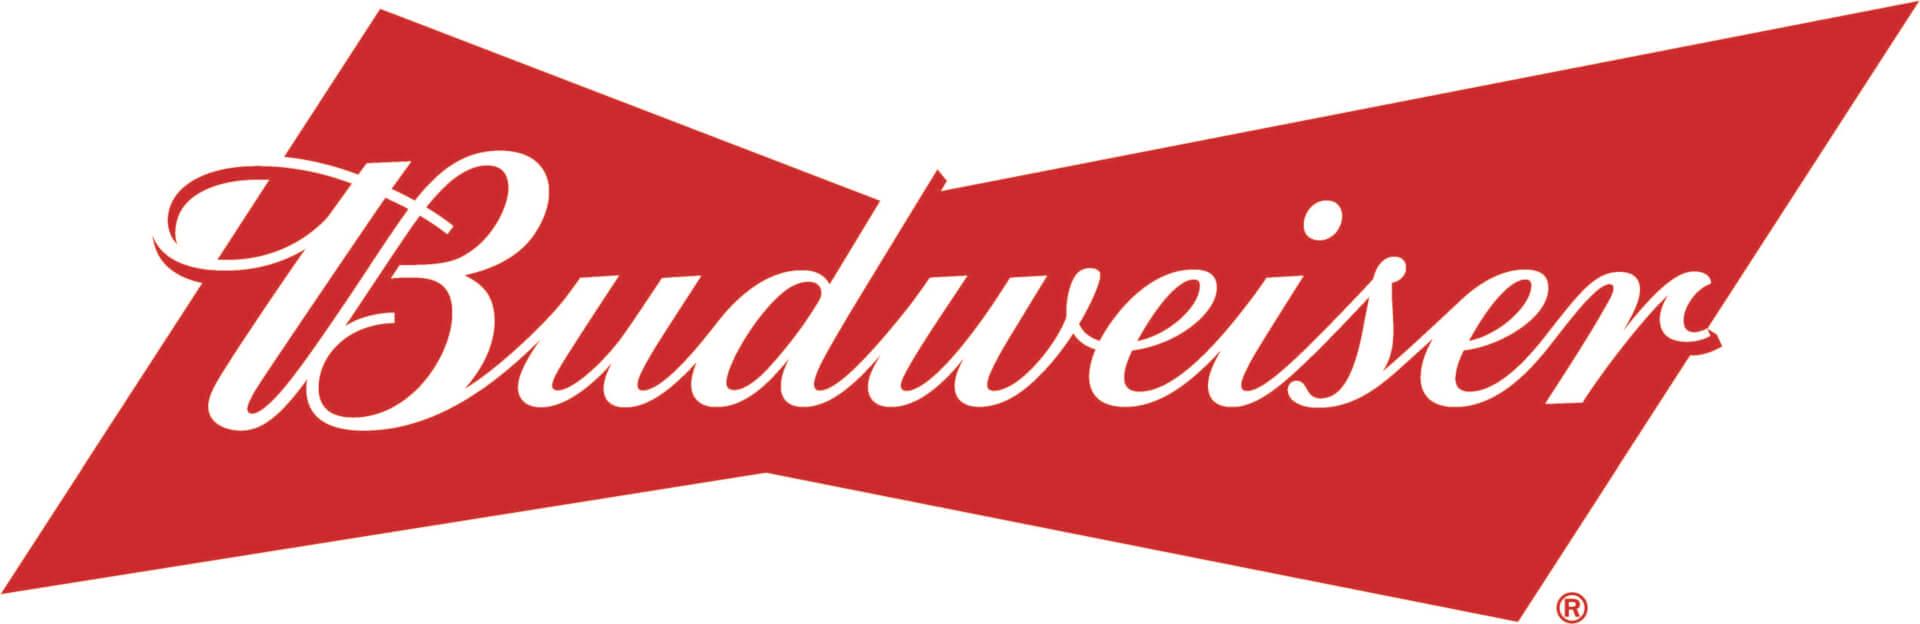 budweiser logo 2016 pikes peak international hill climb rh ppihc org budweiser logopedia budweiser logopedia